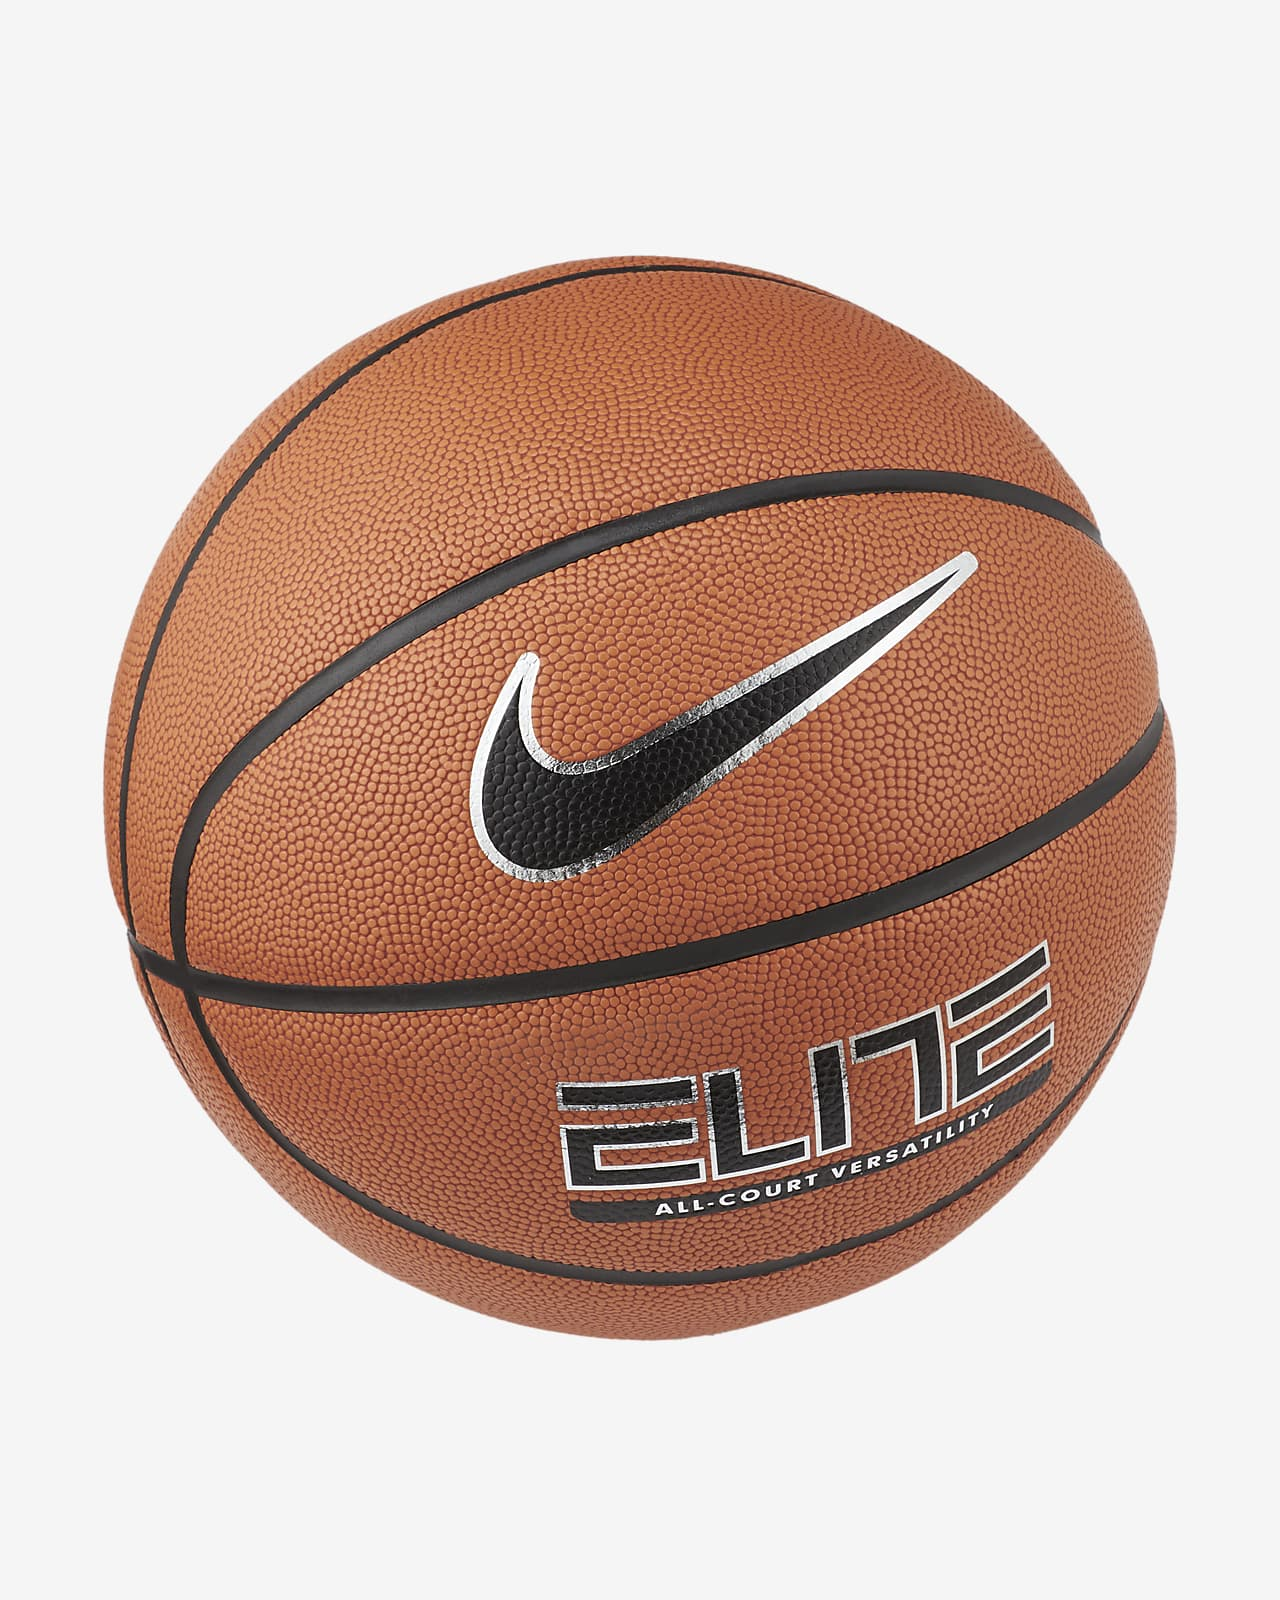 Nike Elite All-Court Basketball (Size 7)